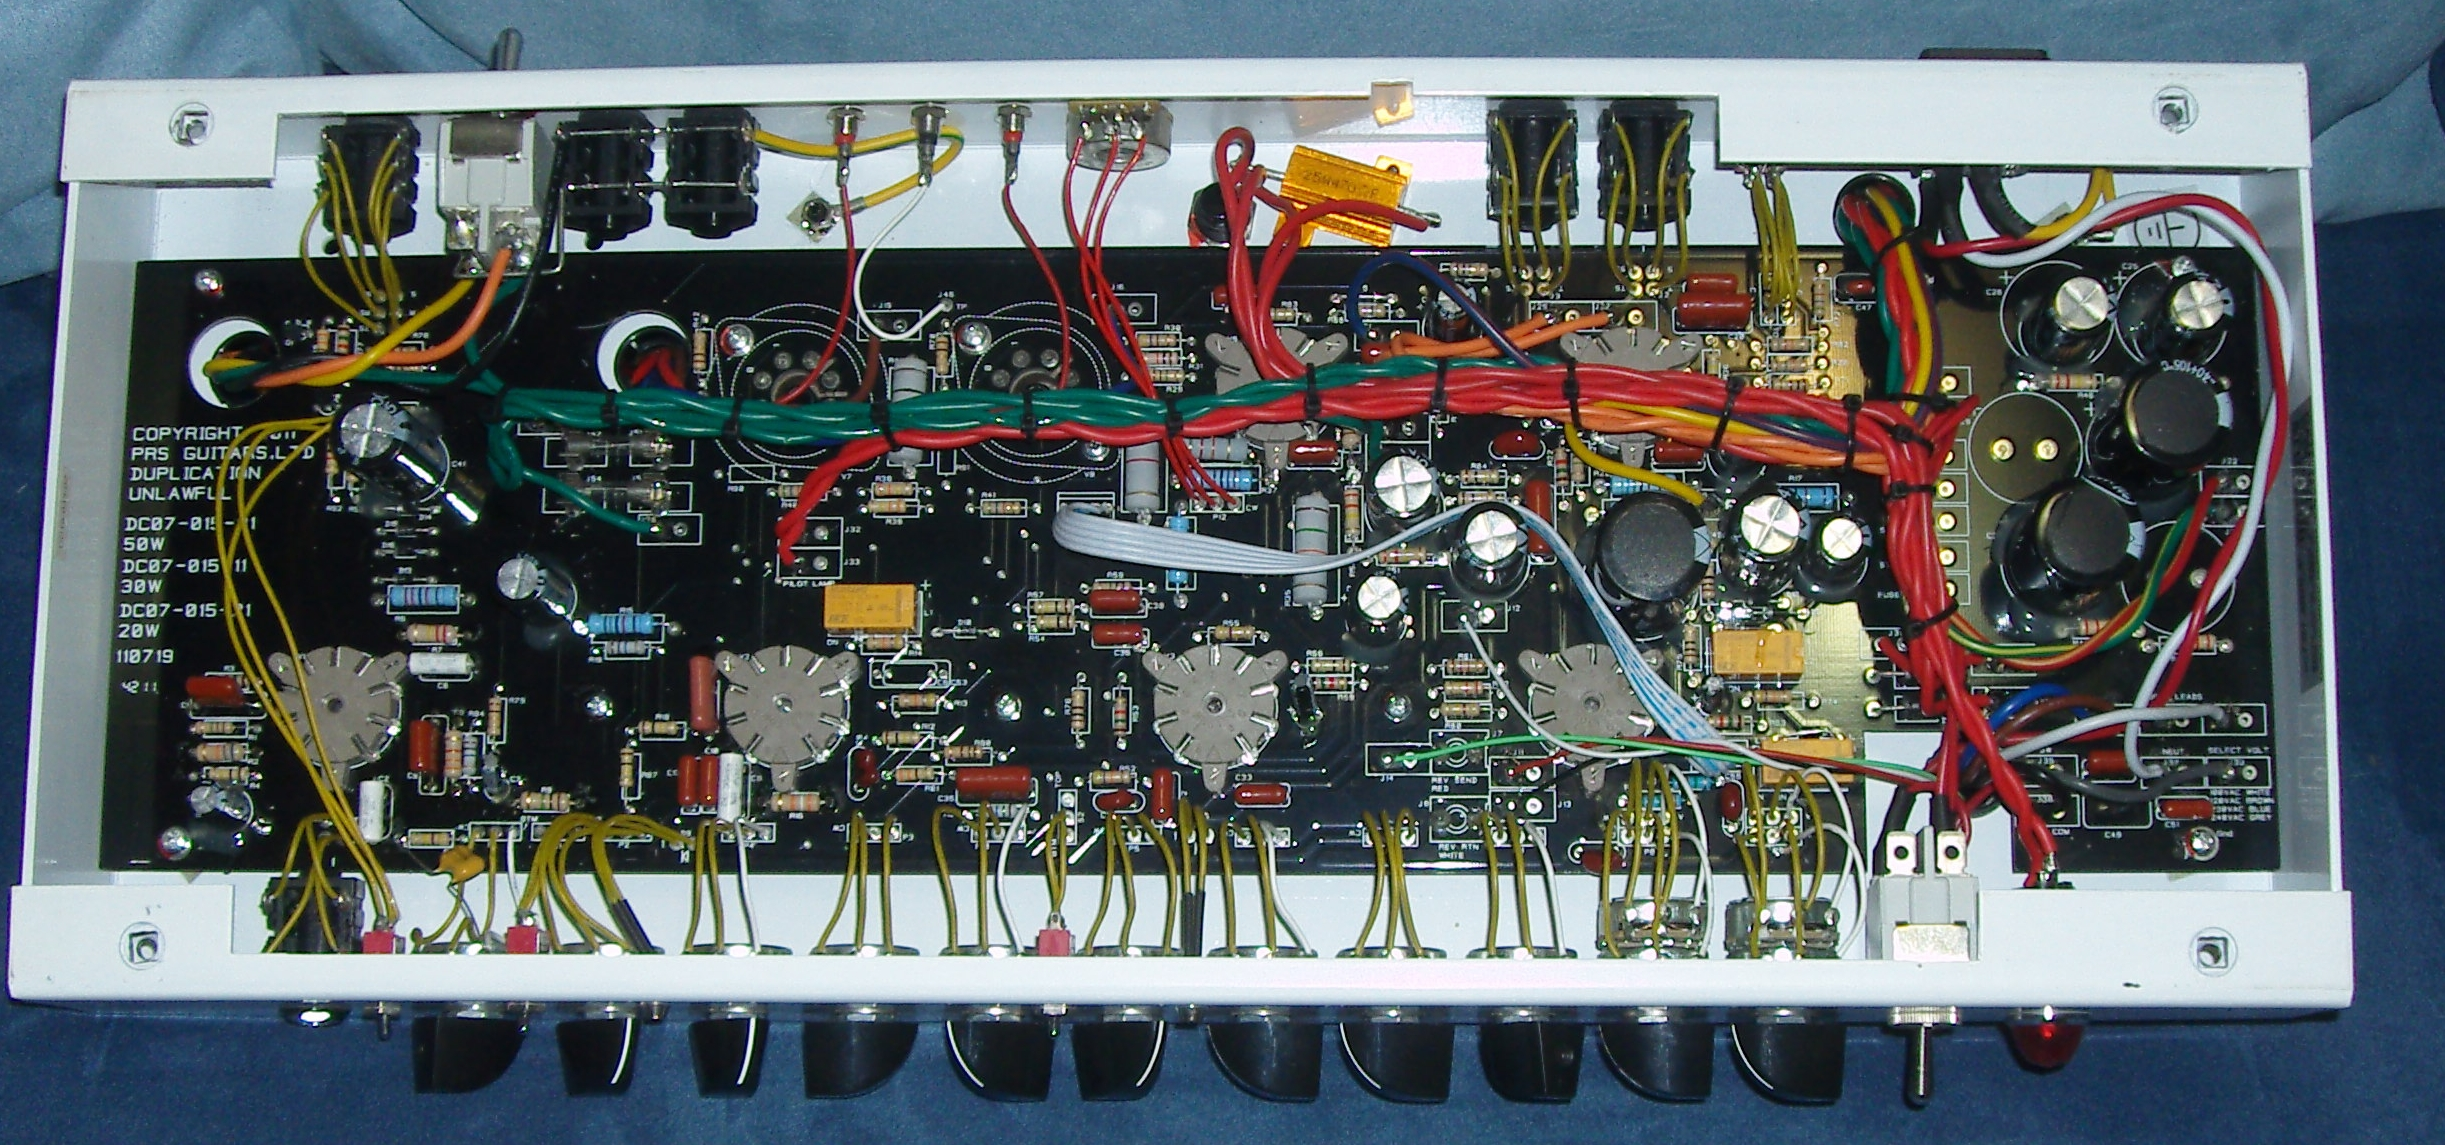 Prs Se Custom 24 Schematic Electrical Diagram Schematics Paul Reed Smith Wiring Diagrams 30 Amp Diy Enthusiasts U2022 Emerald Green